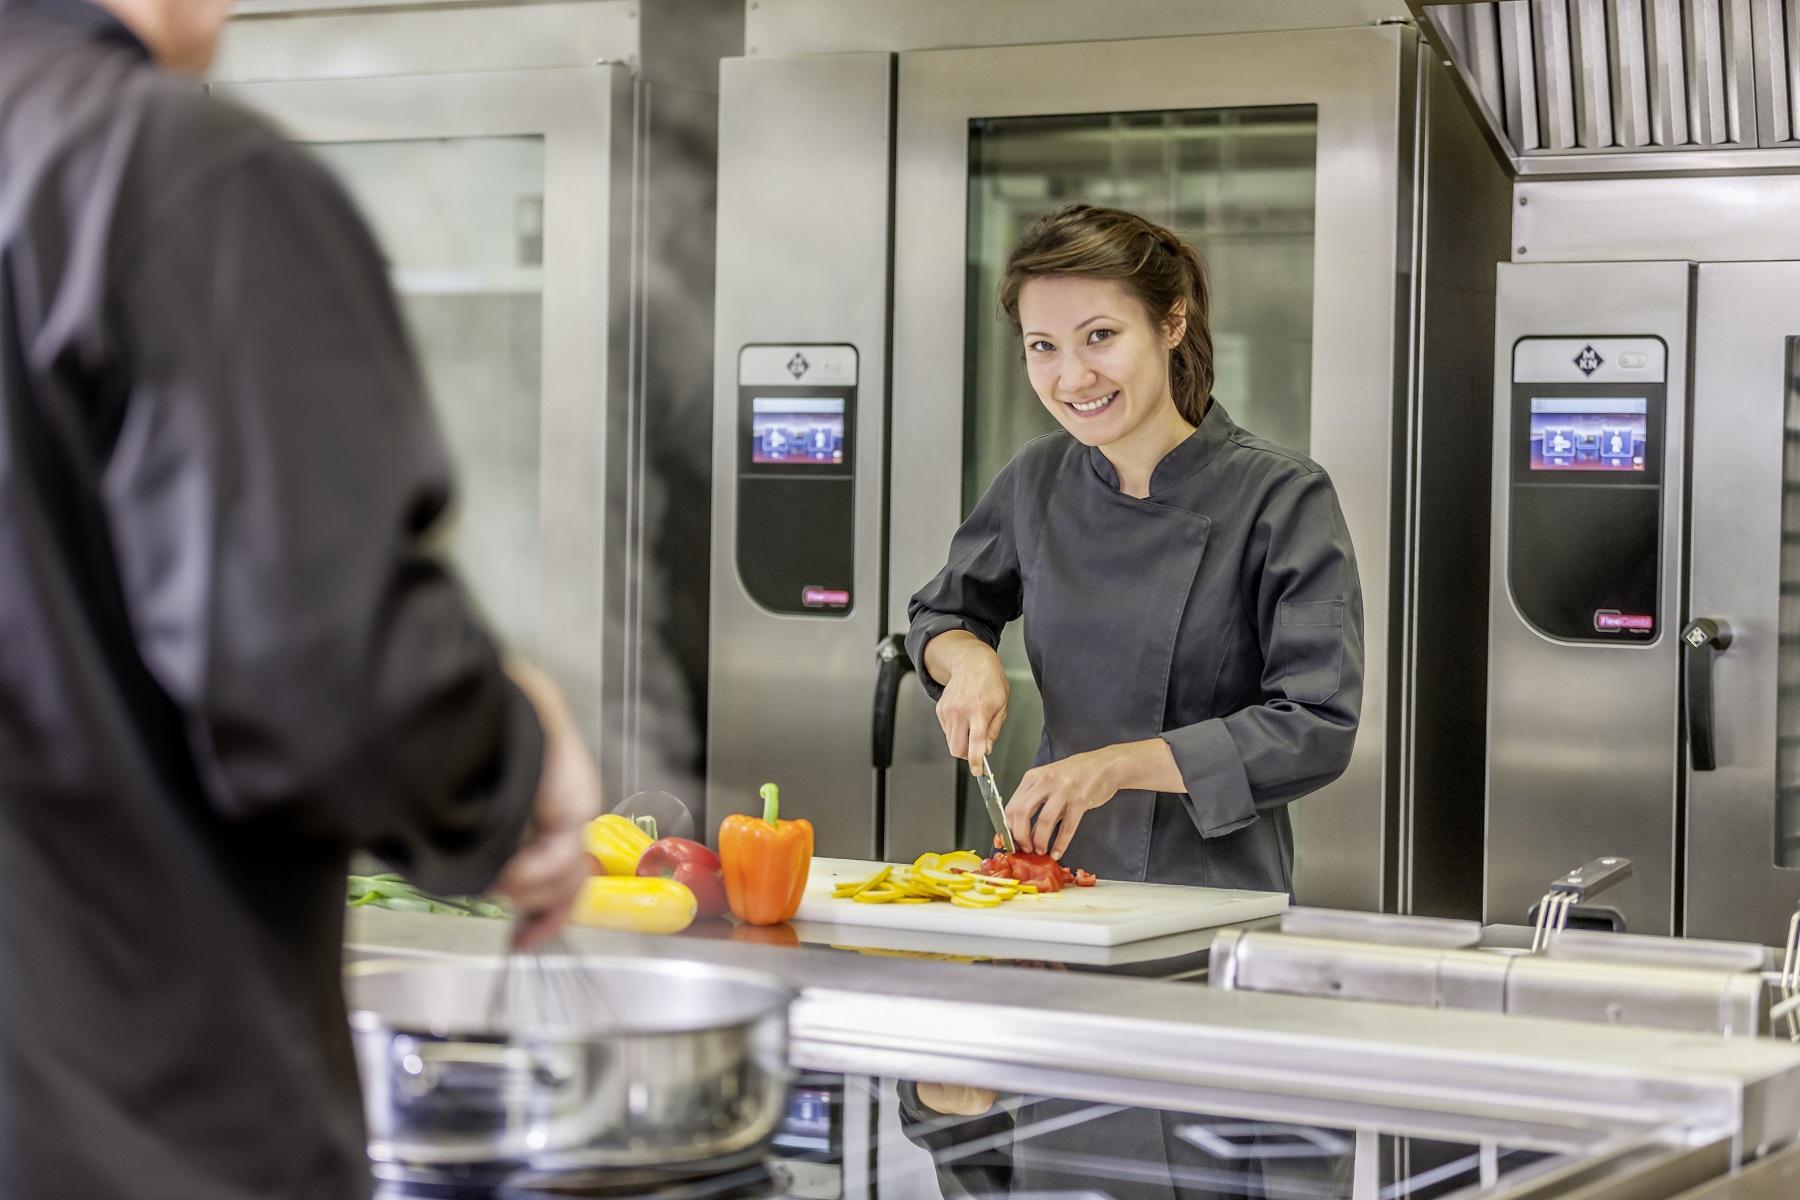 Mkn Flexicombi Chef.jpg Klein